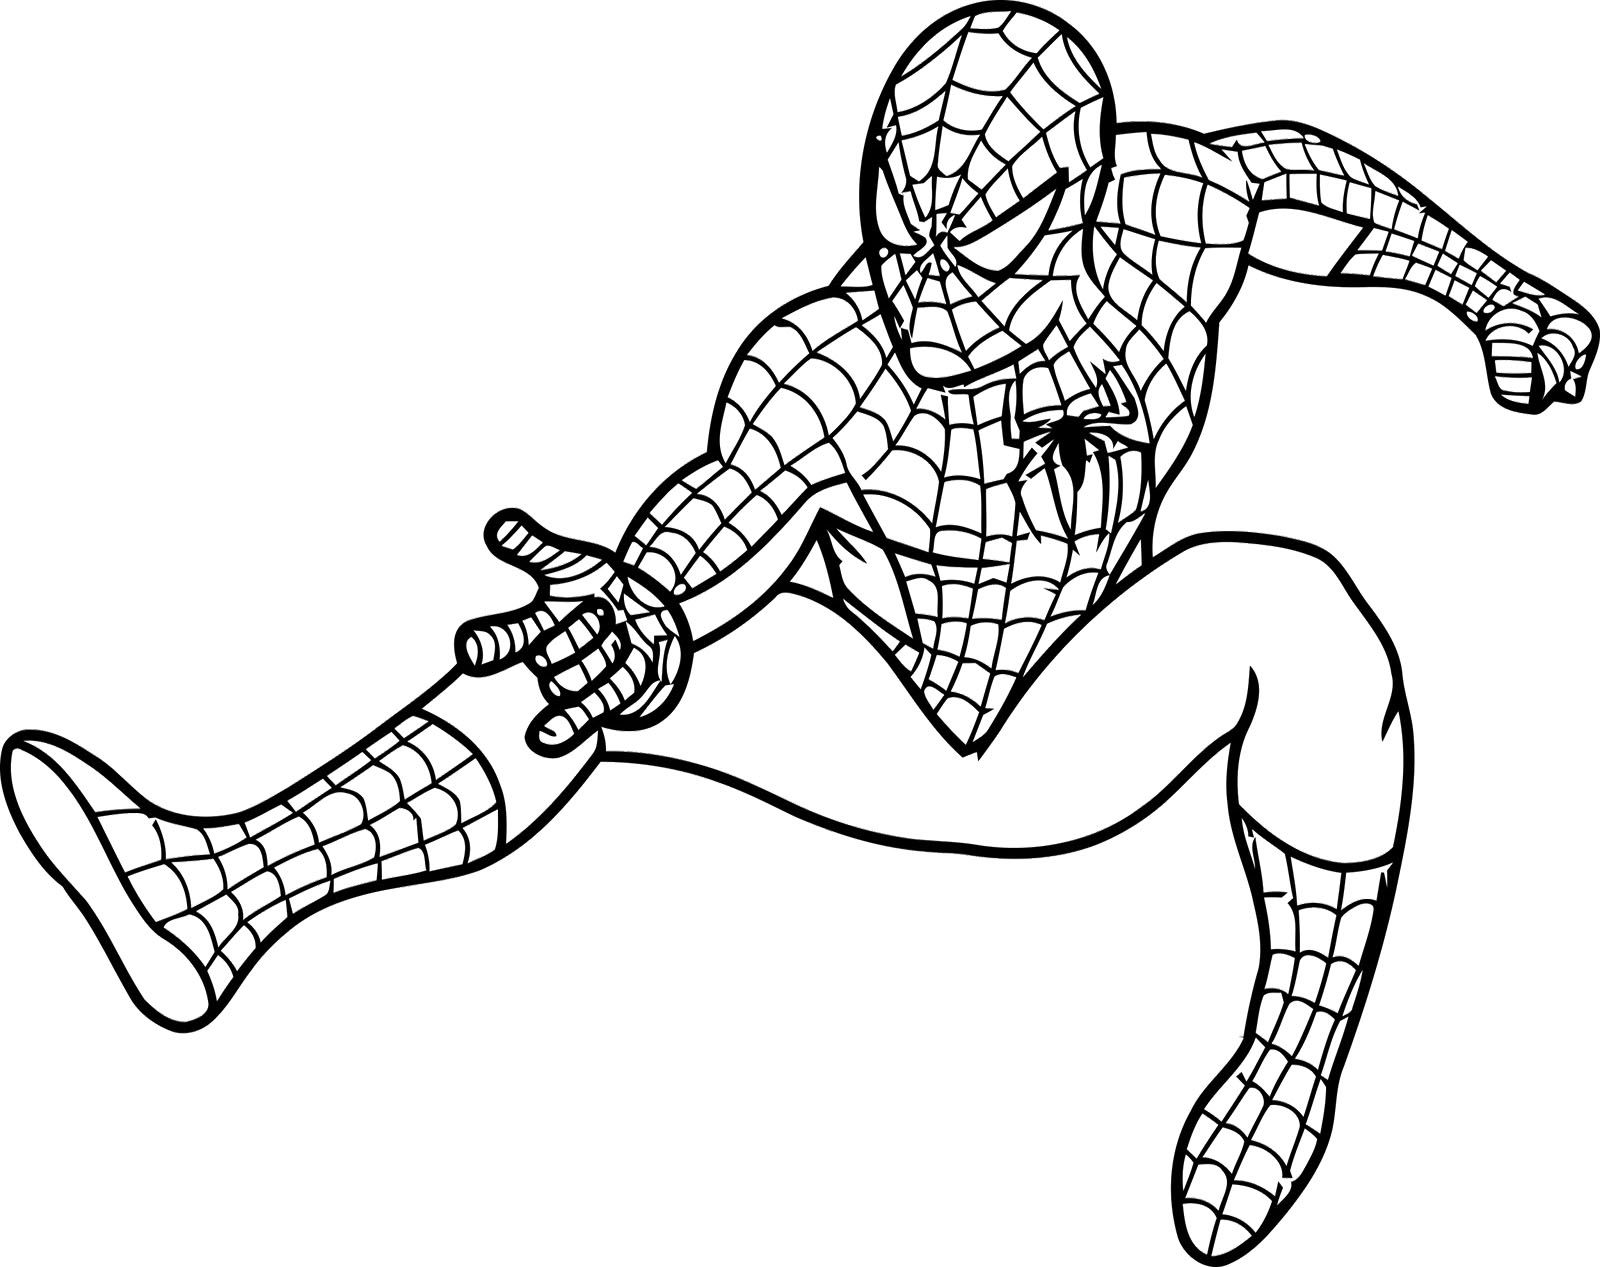 Colouring Spiderman Cartoon